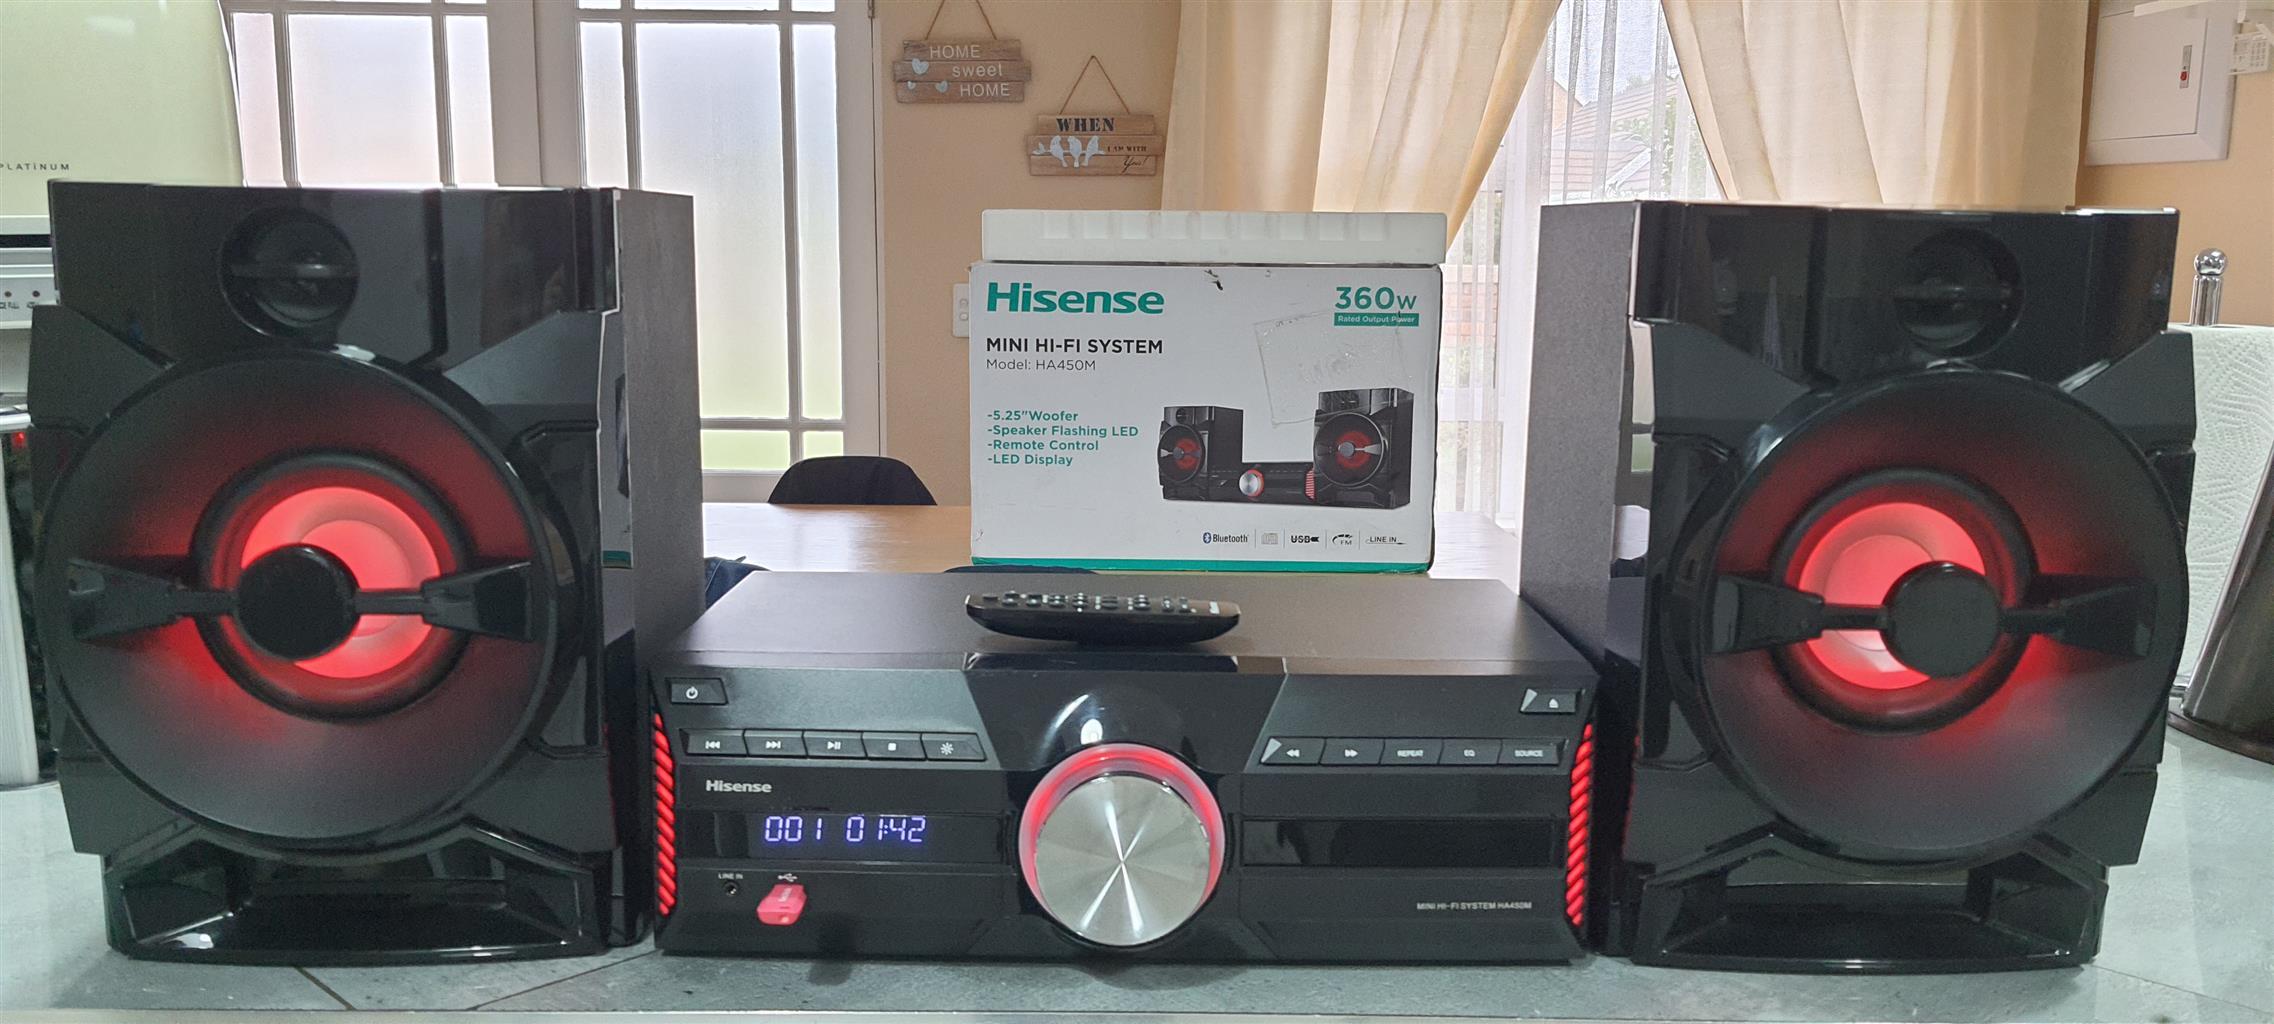 2 x Sound Systems - Powerful Hisense Hifi's